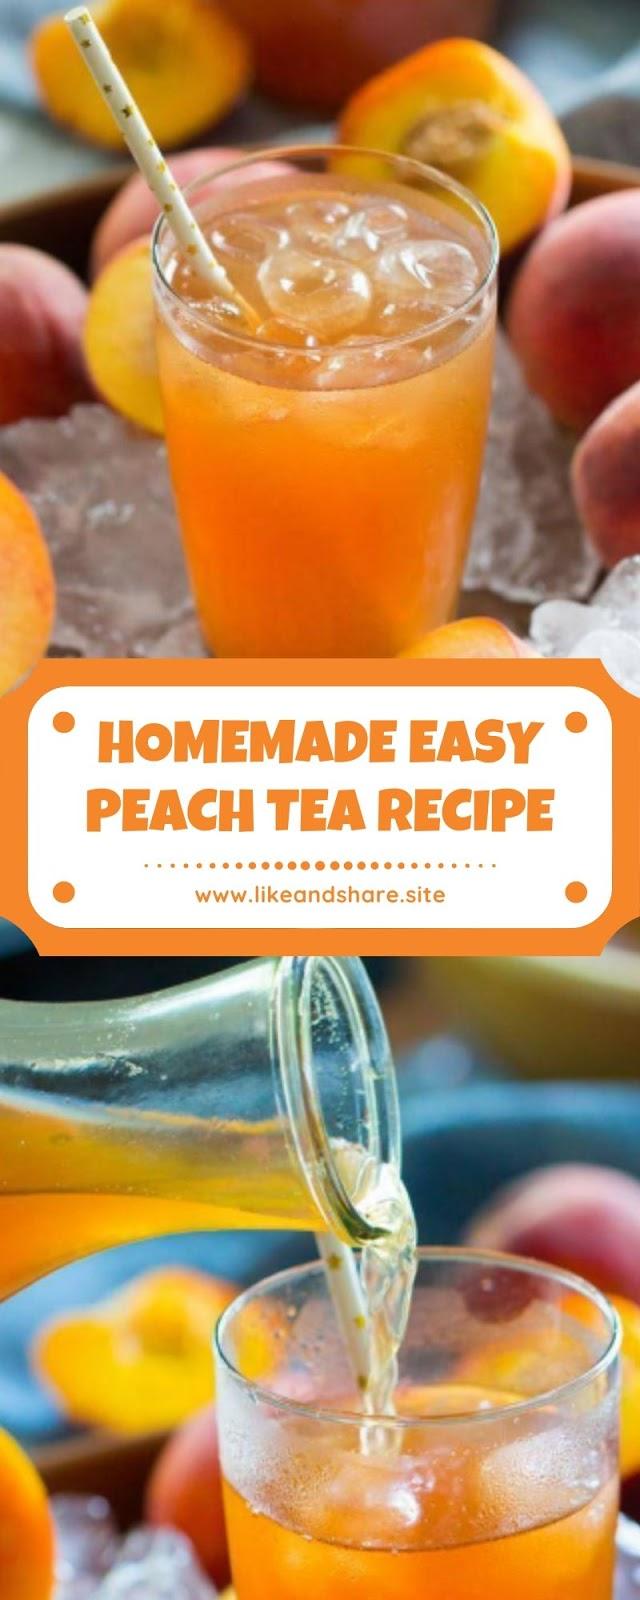 HOMEMADE EASY PEACH TEA RECIPE